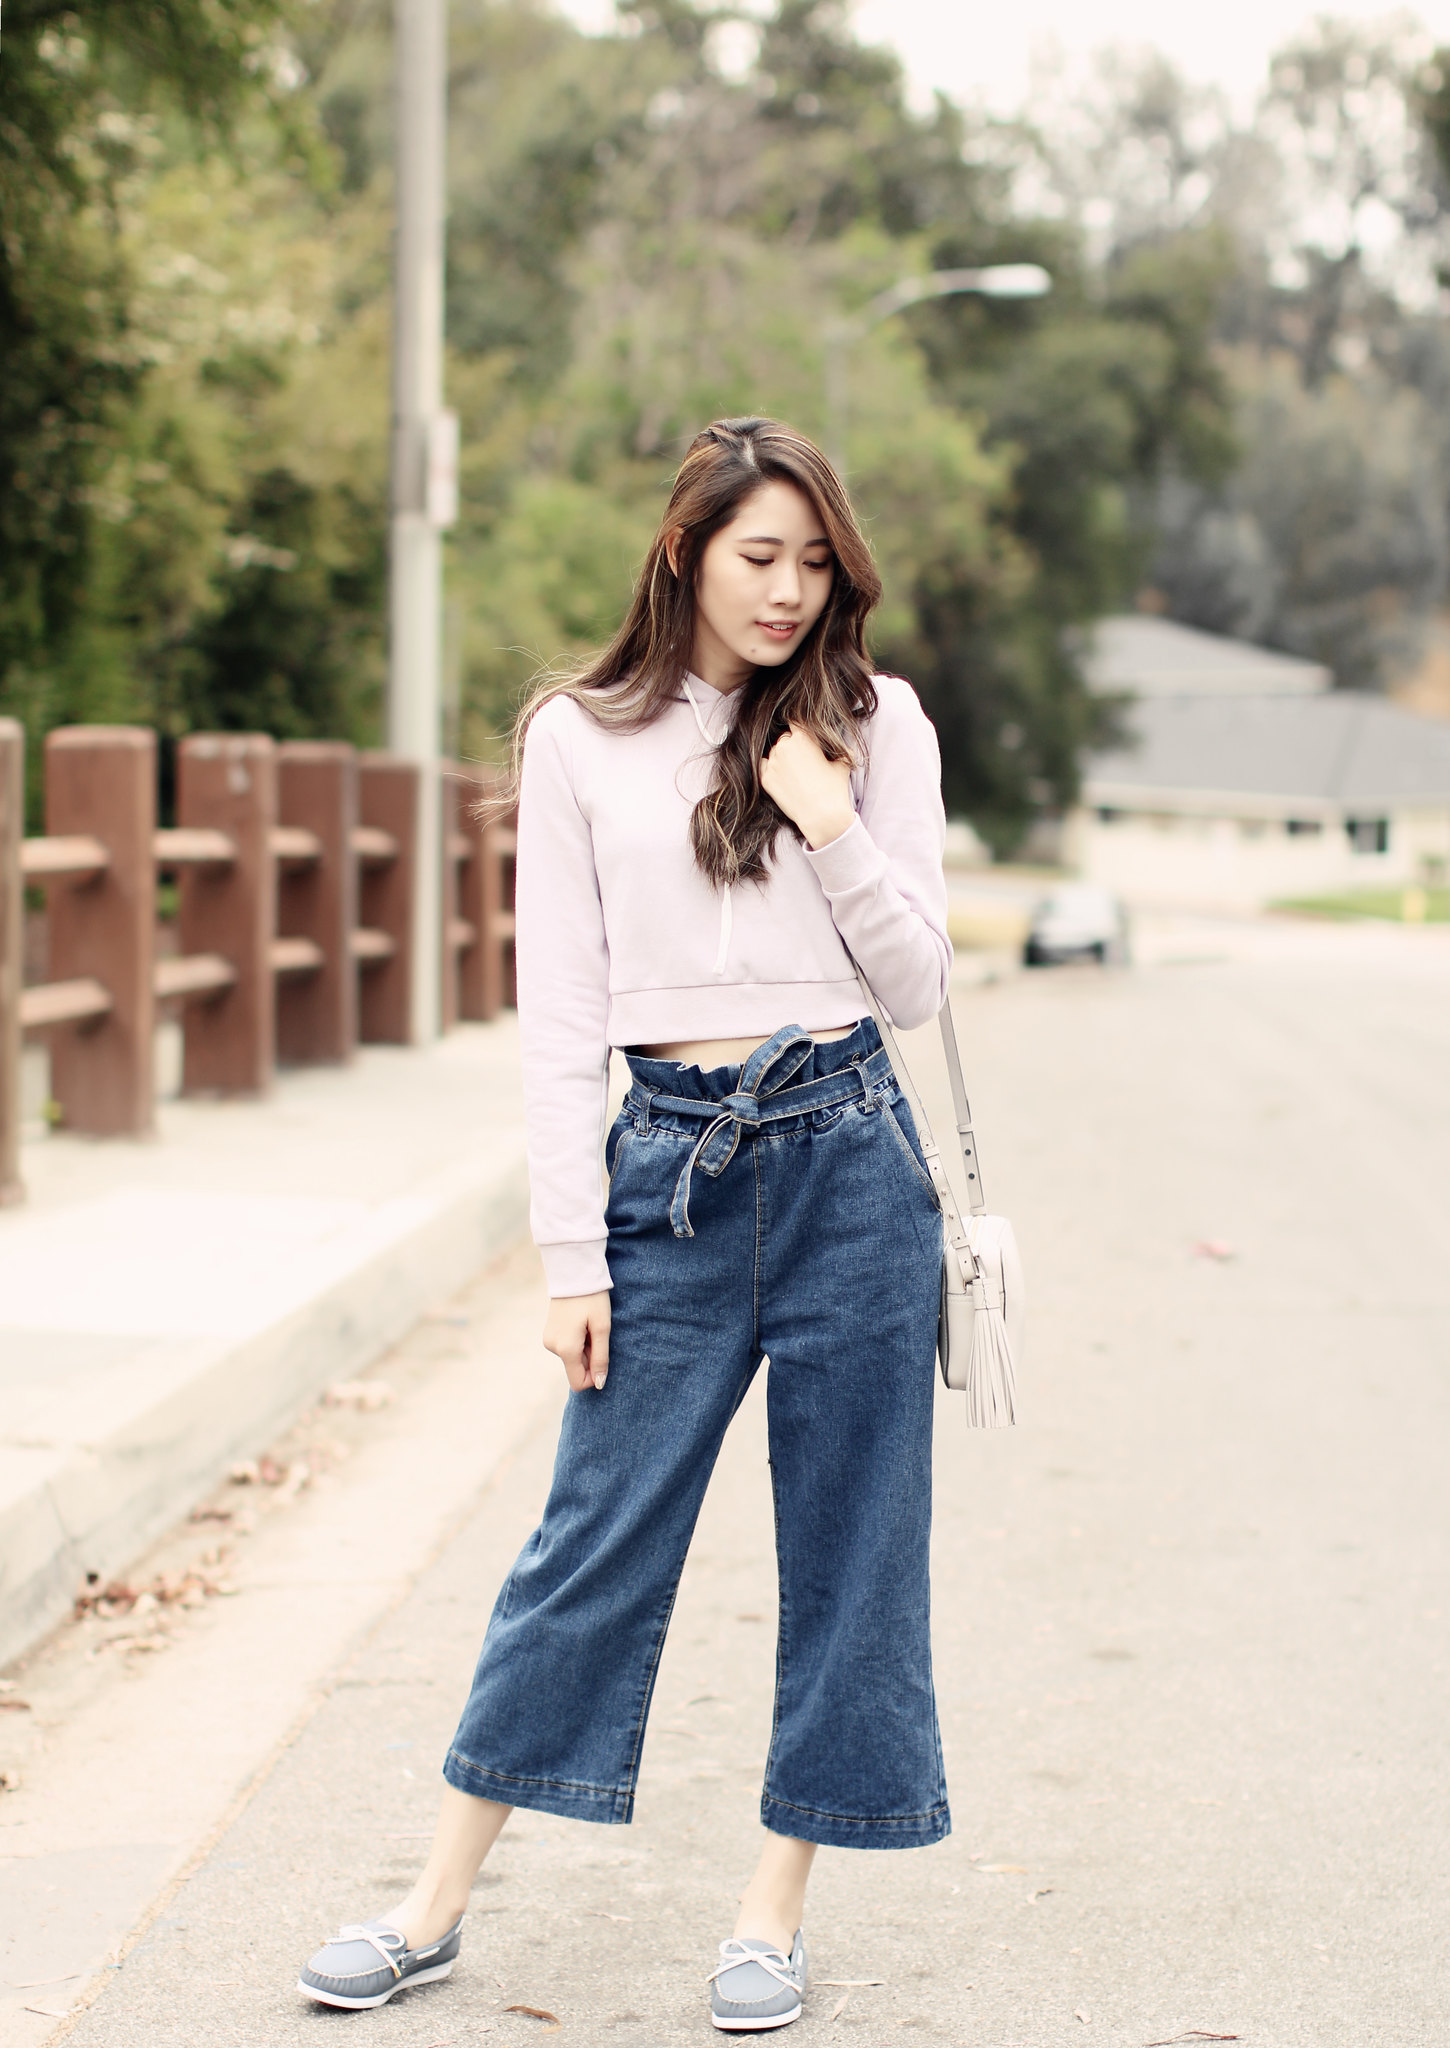 5055-ootd-fashion-style-outfitoftheday-wiwt-streetstyle-zara-f21xme-denim-thrifted-guess-koreanfashion-lookbook-elizabeeetht-clothestoyouuu